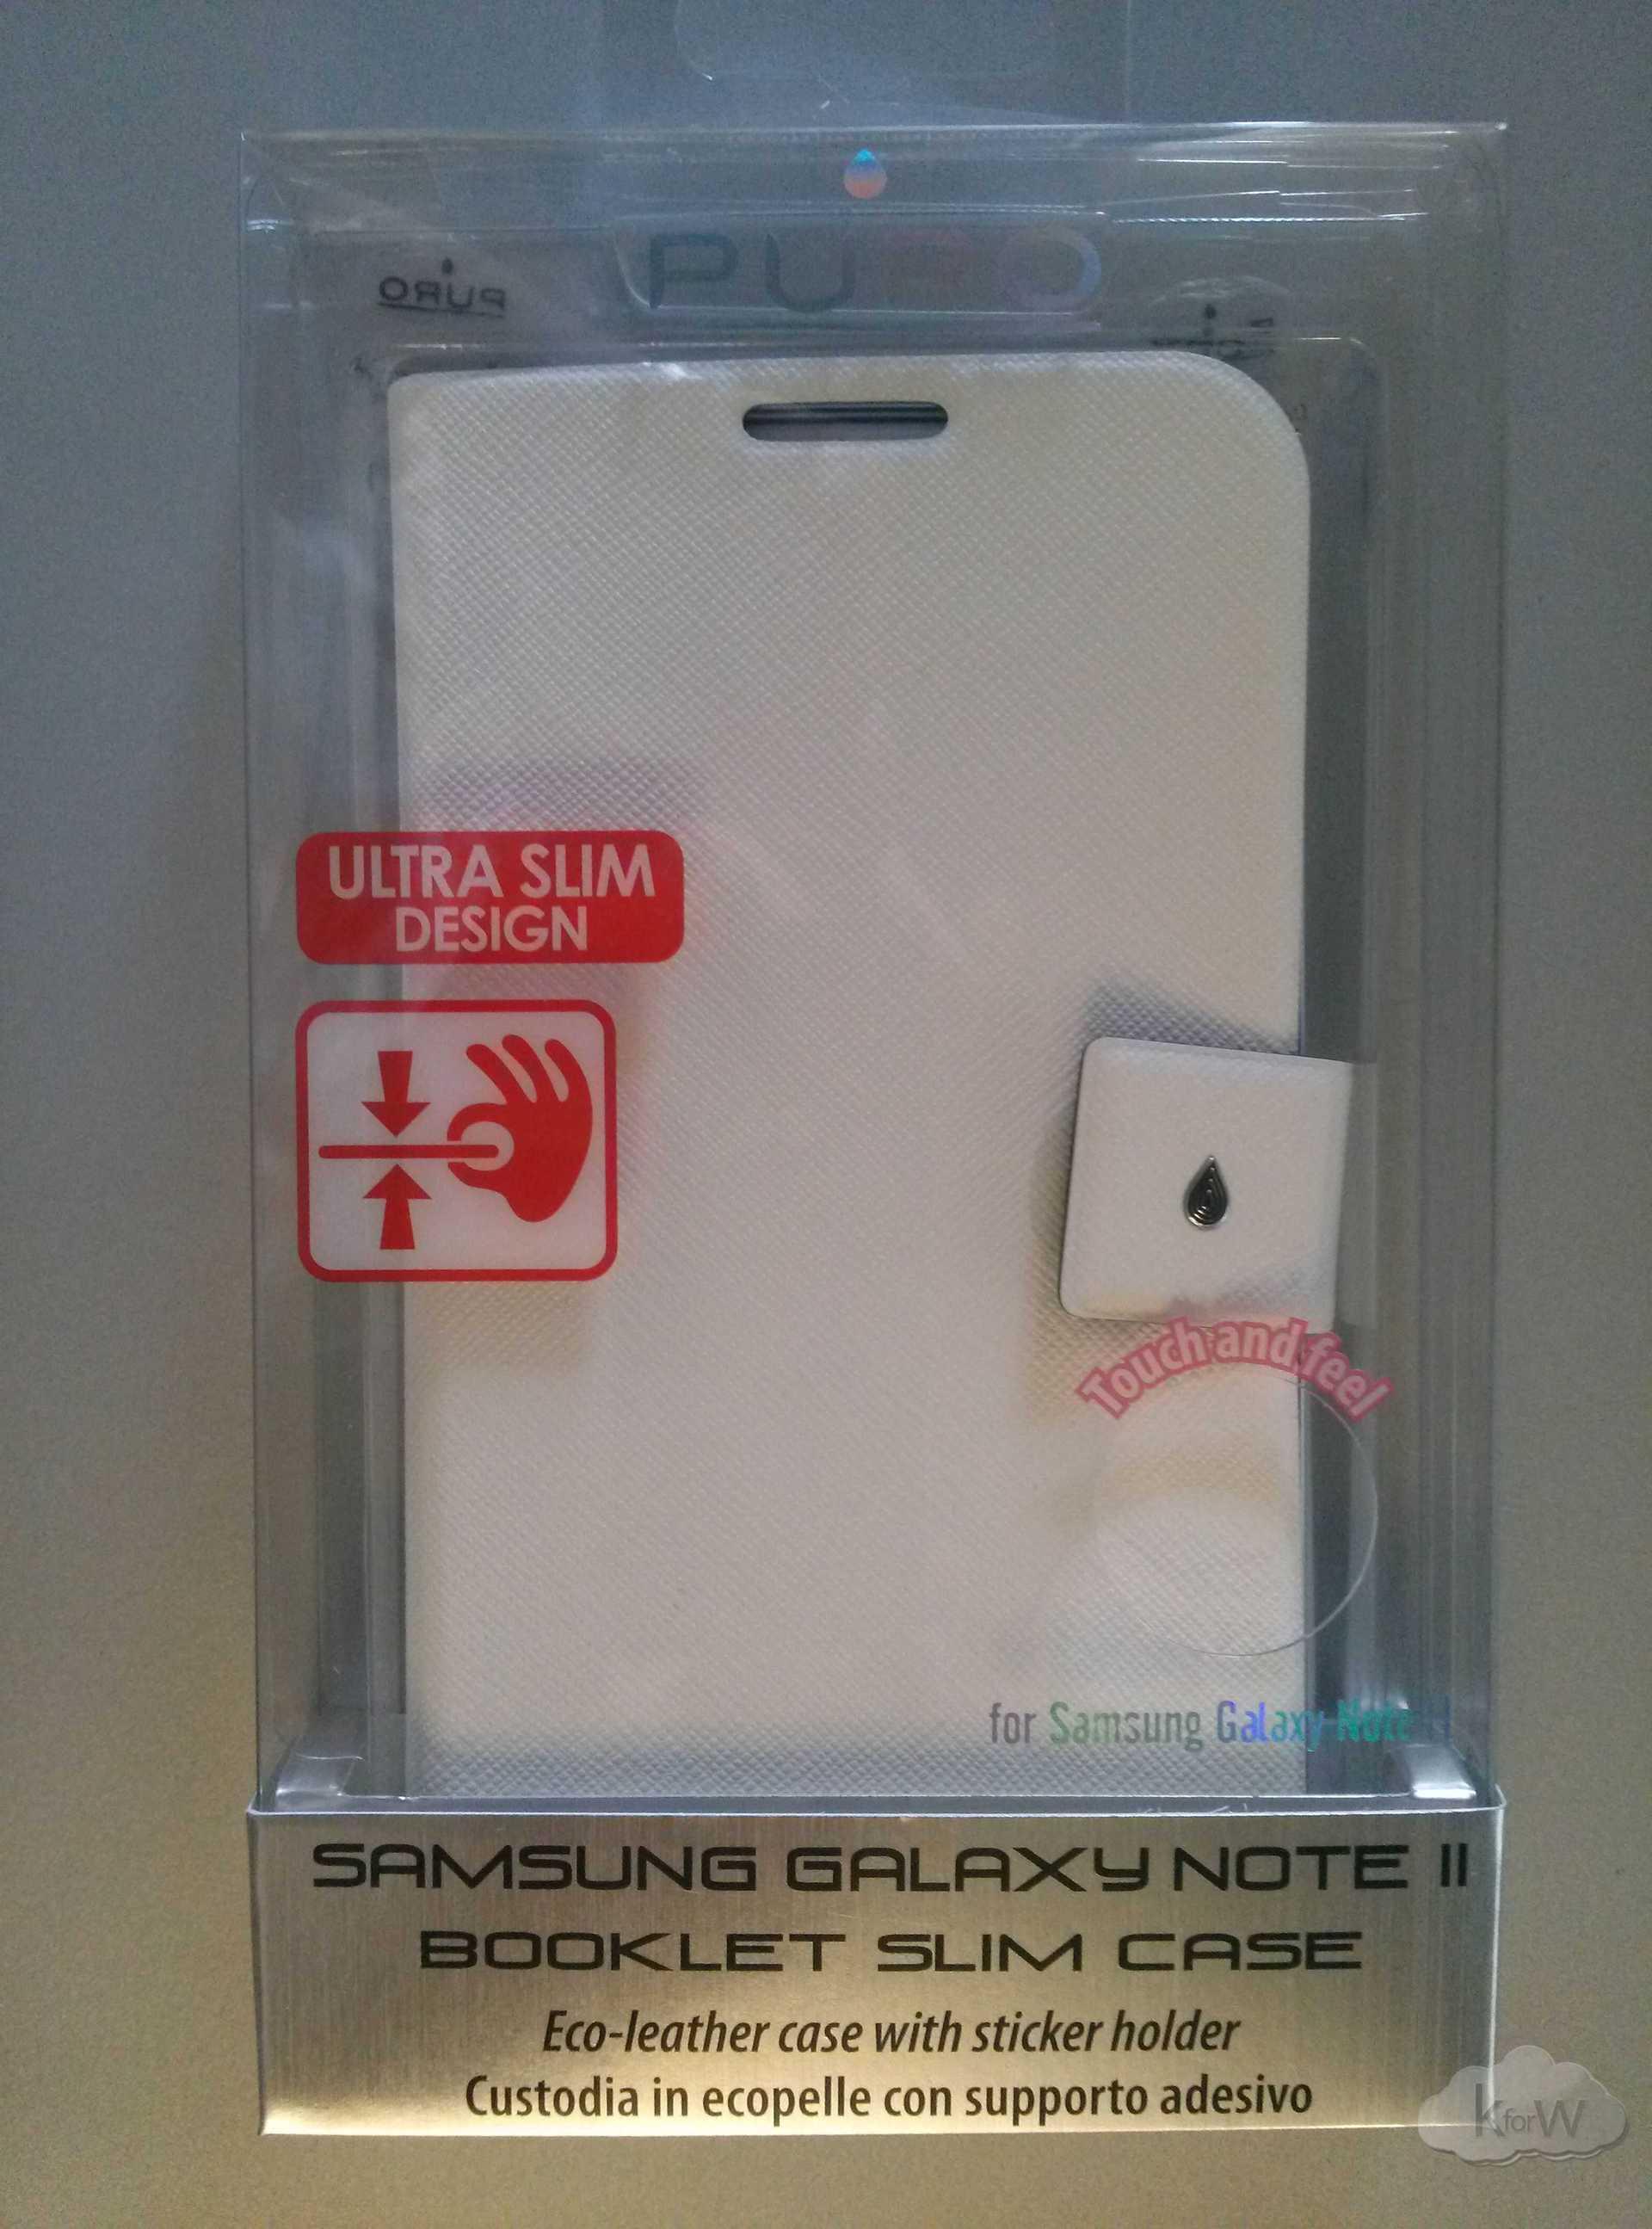 Recensione – Puro Booklet Slim per Galaxy Note II